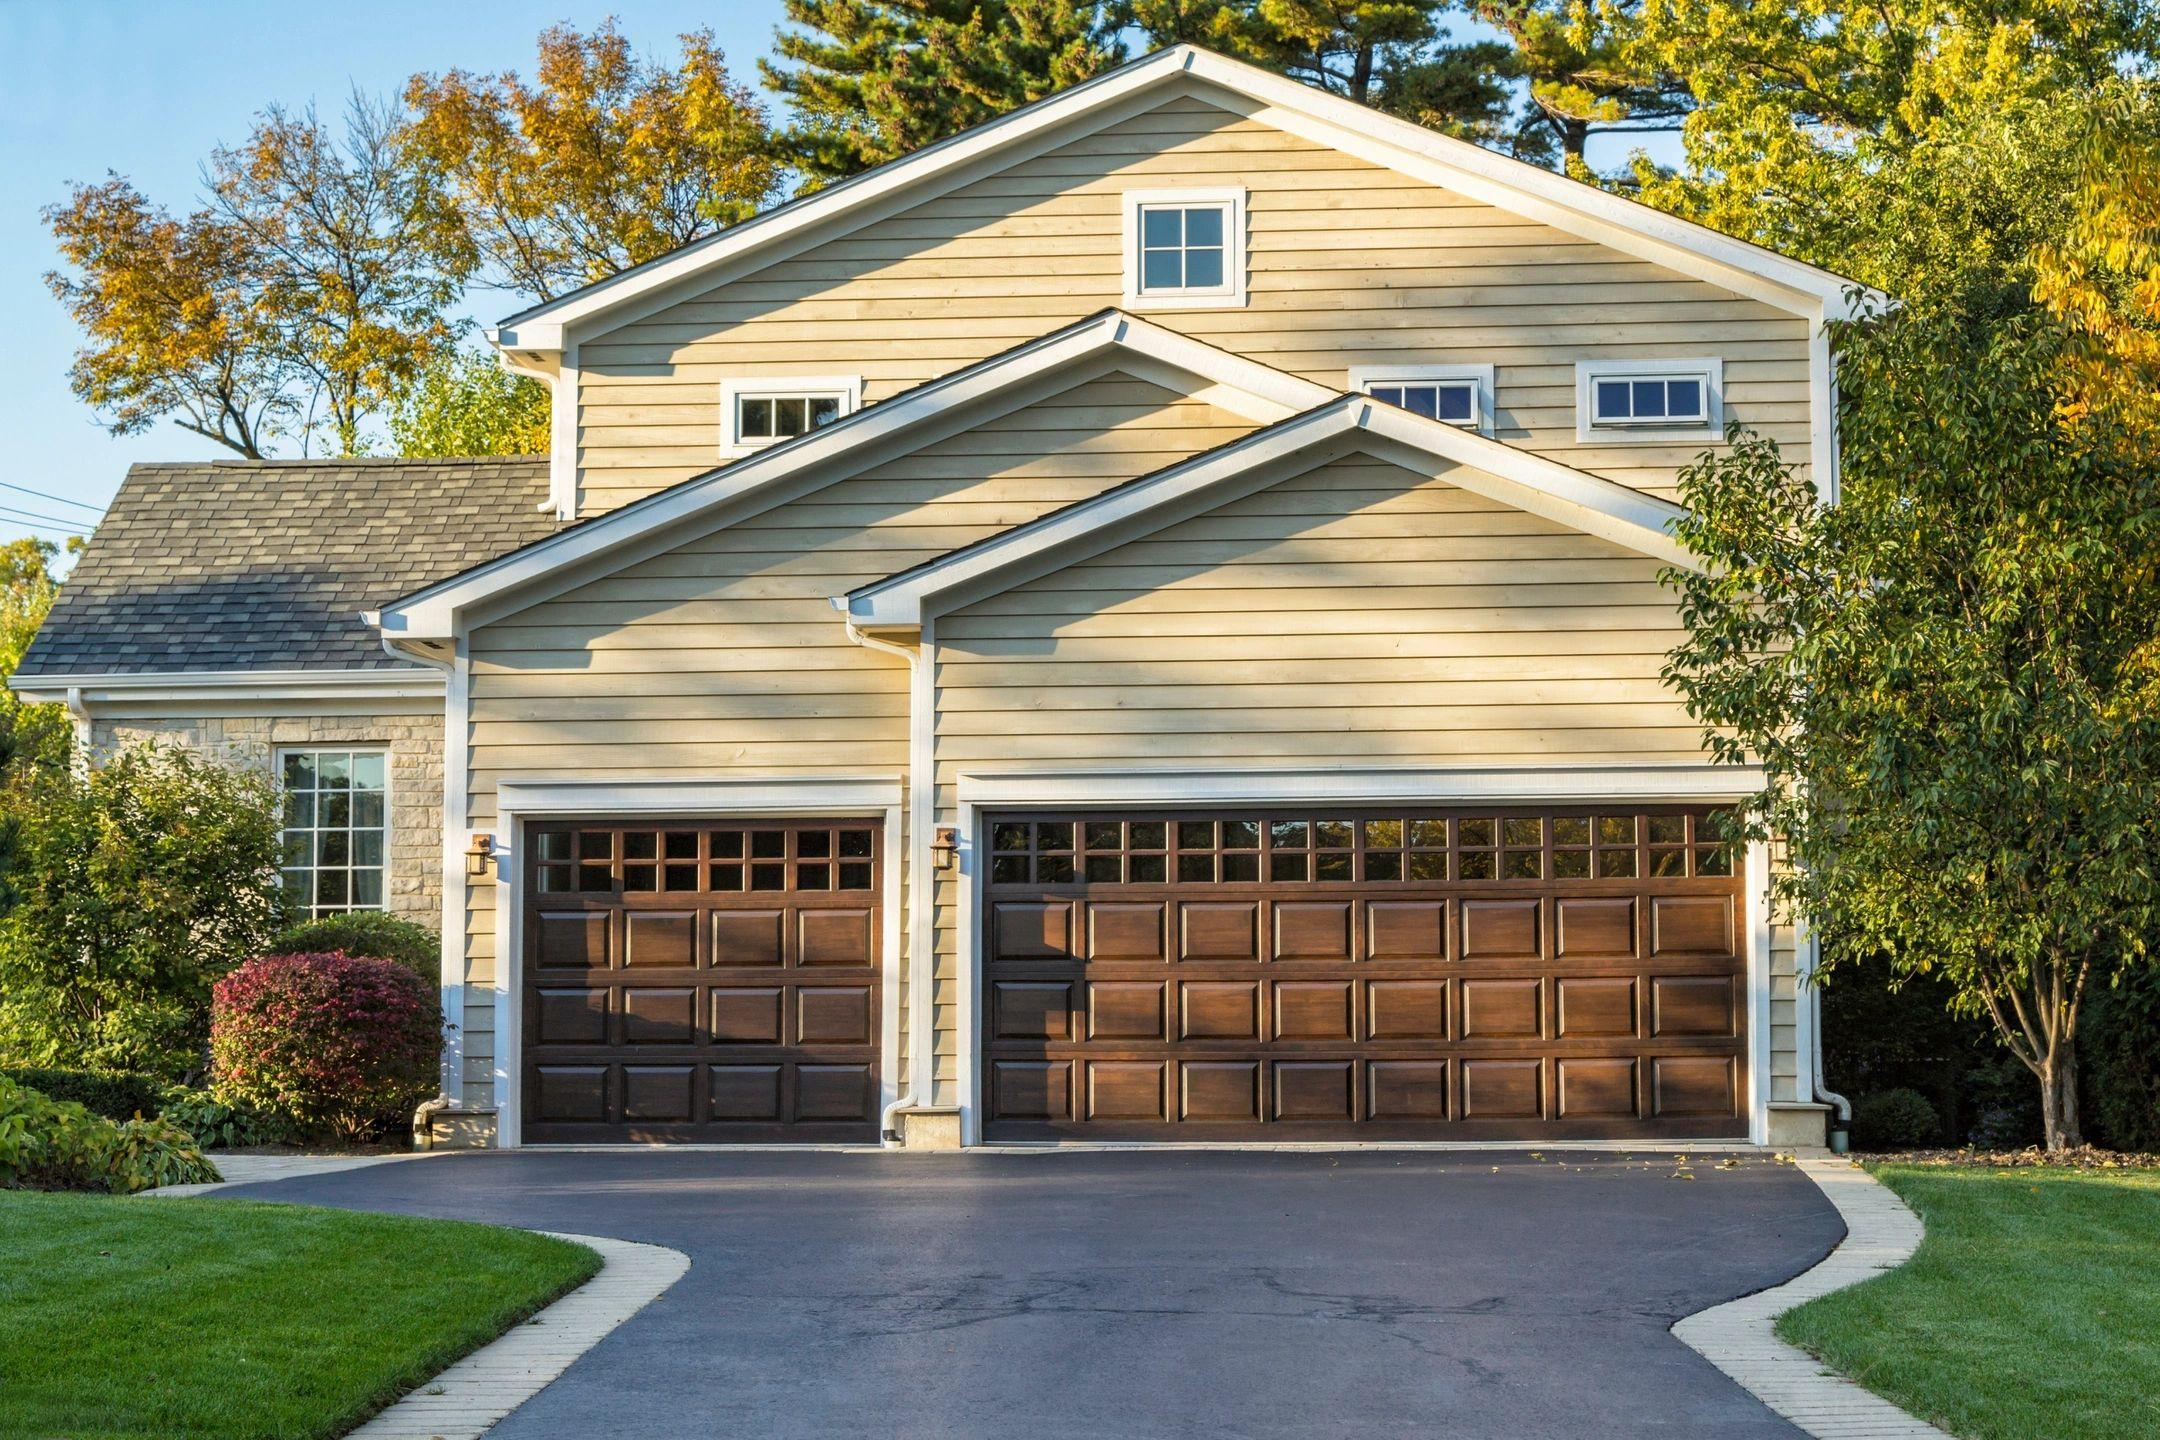 Garage door repair in oklahoma city guaranteed overhead door rubansaba